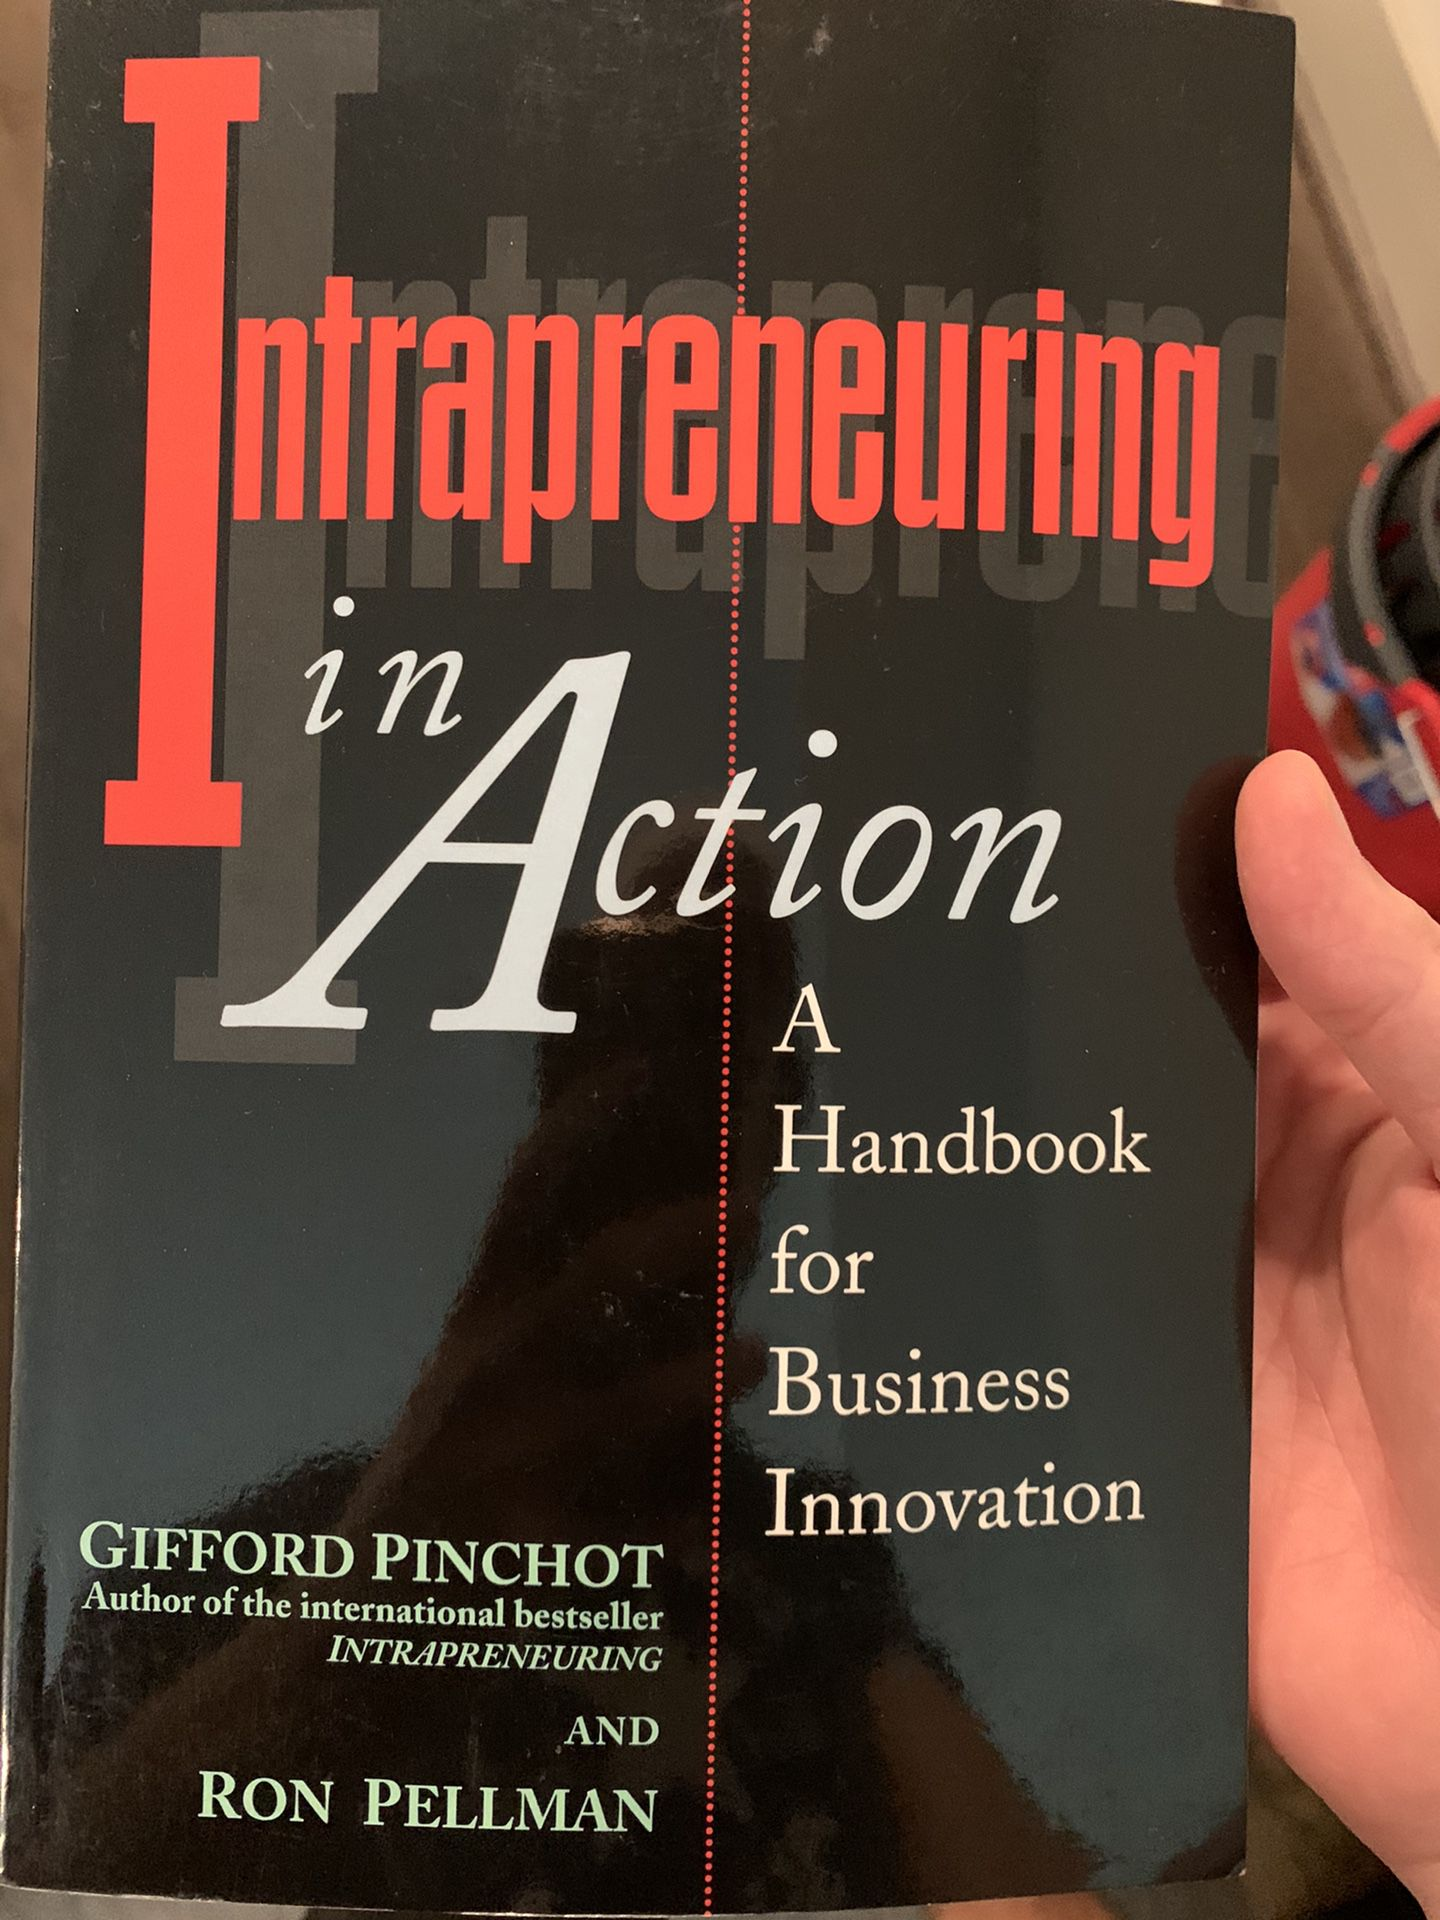 Intrapreneuring in Action